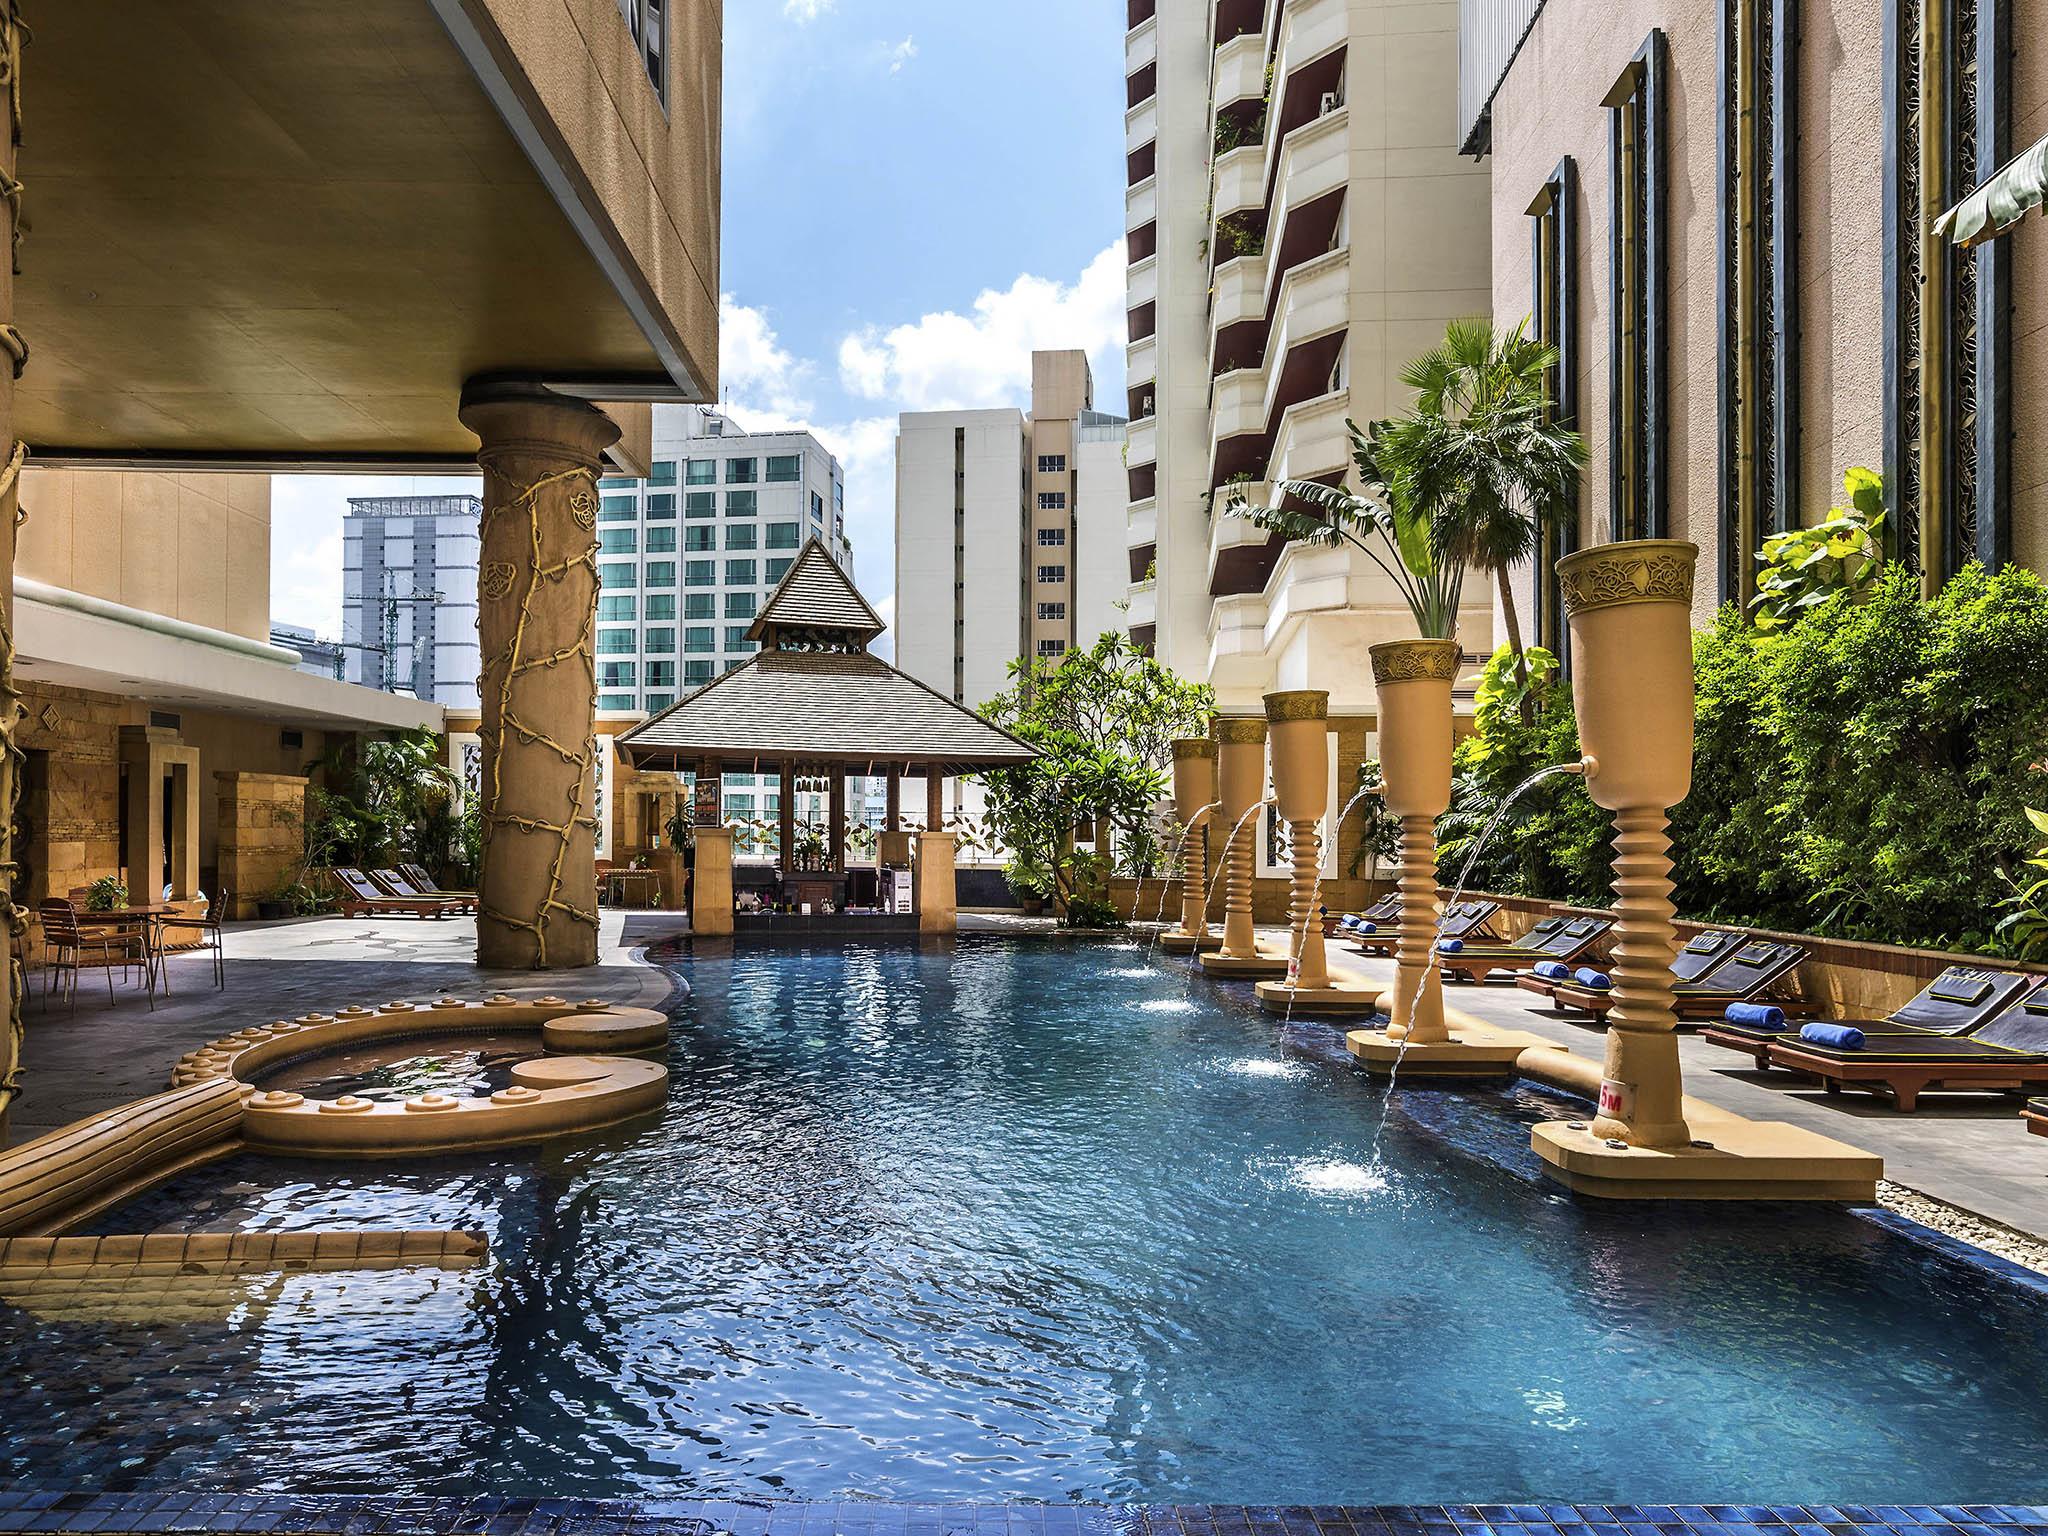 JW Marriott Hotel Bangkok - TripAdvisor